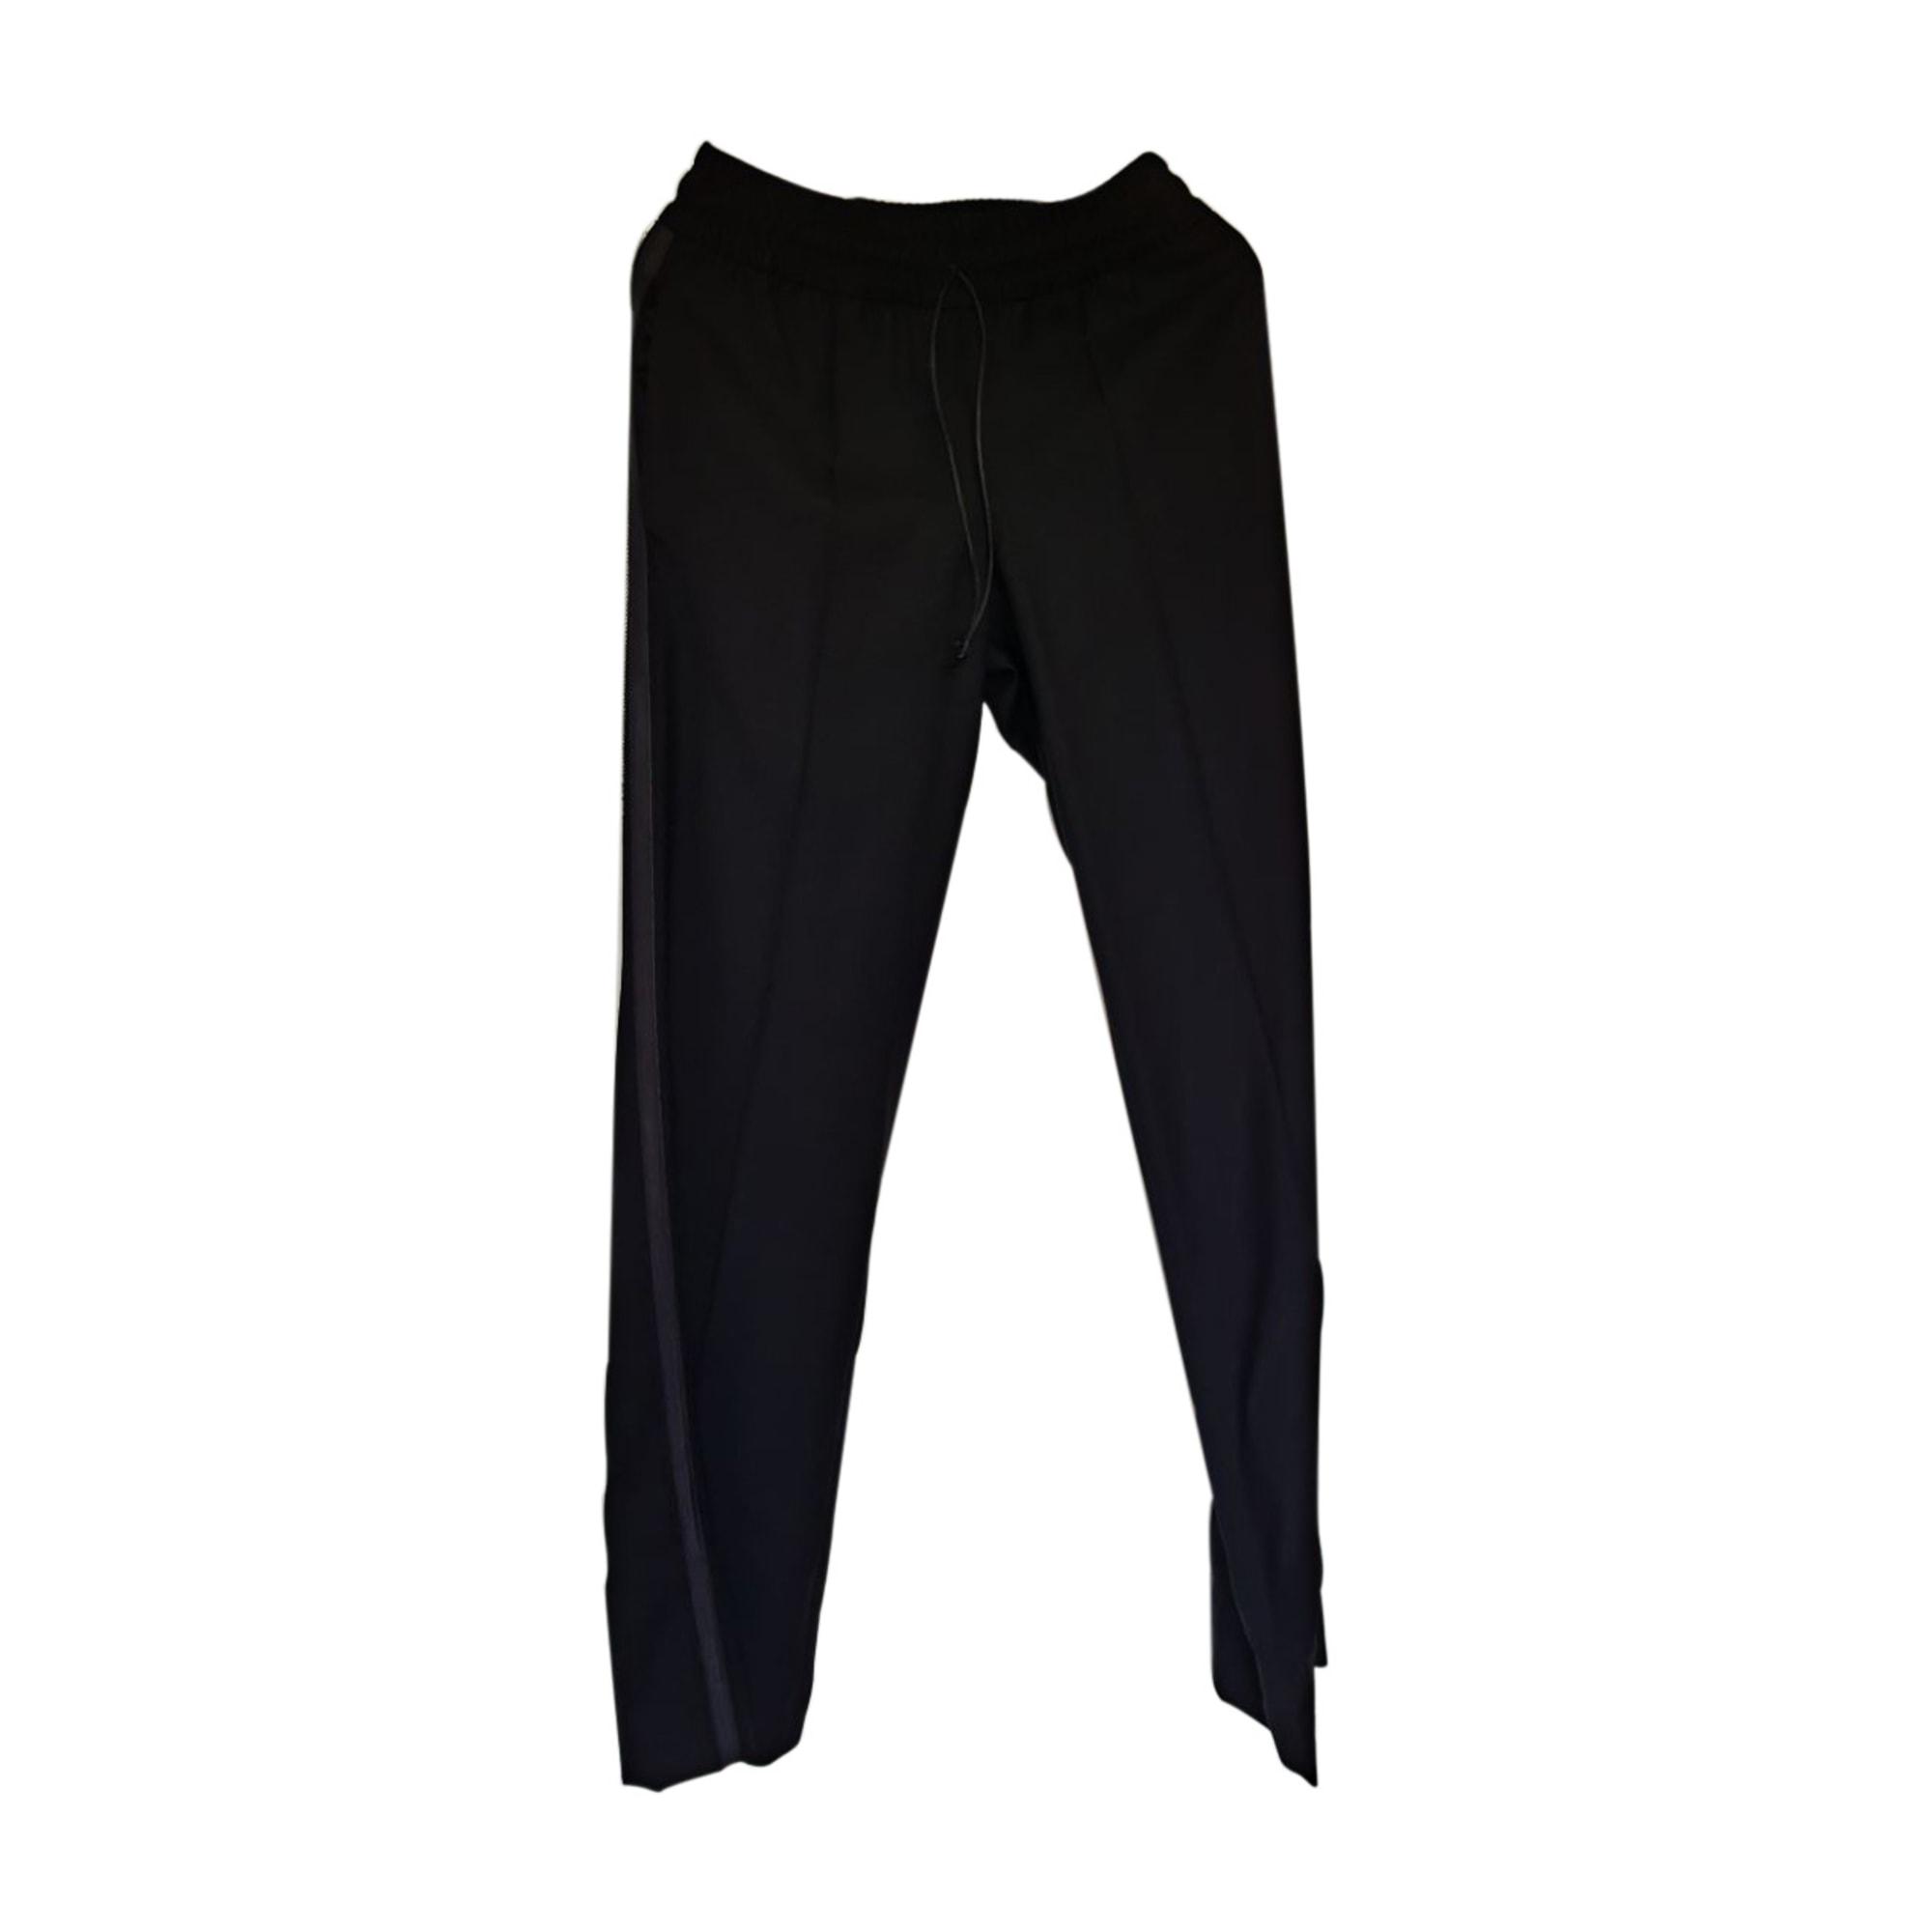 Pantalon droit ISABEL MARANT Noir